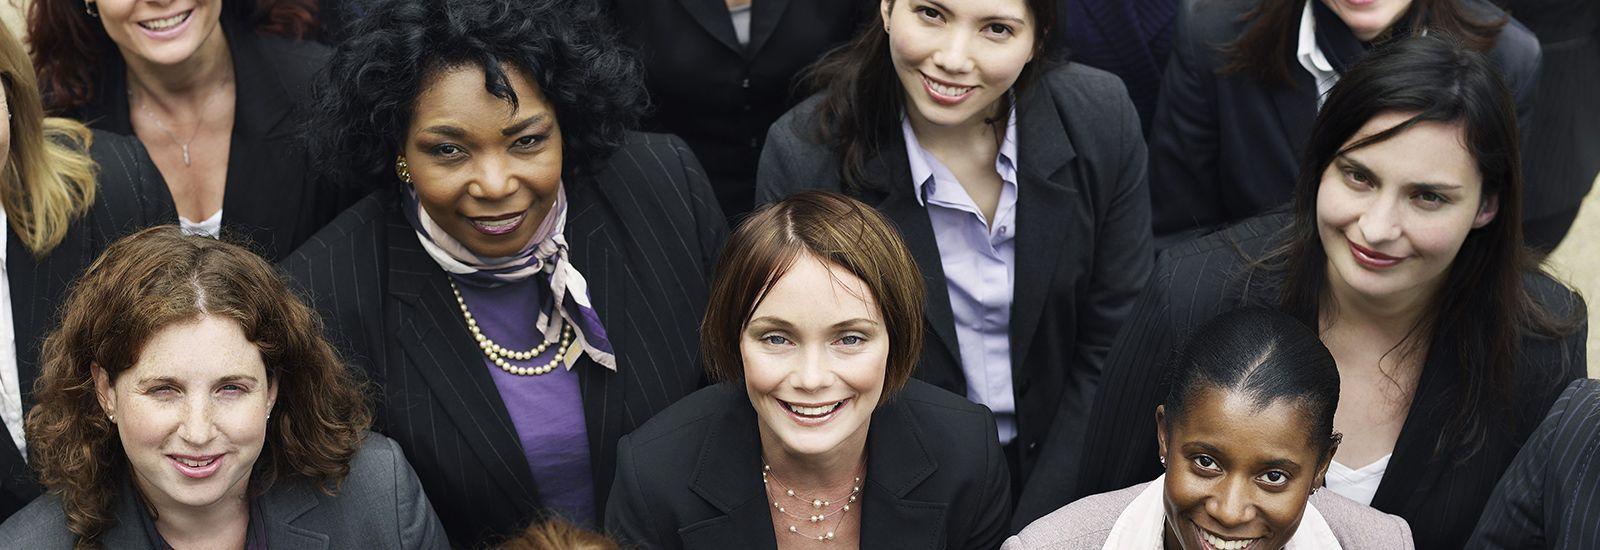 Group of smiling businesswomen